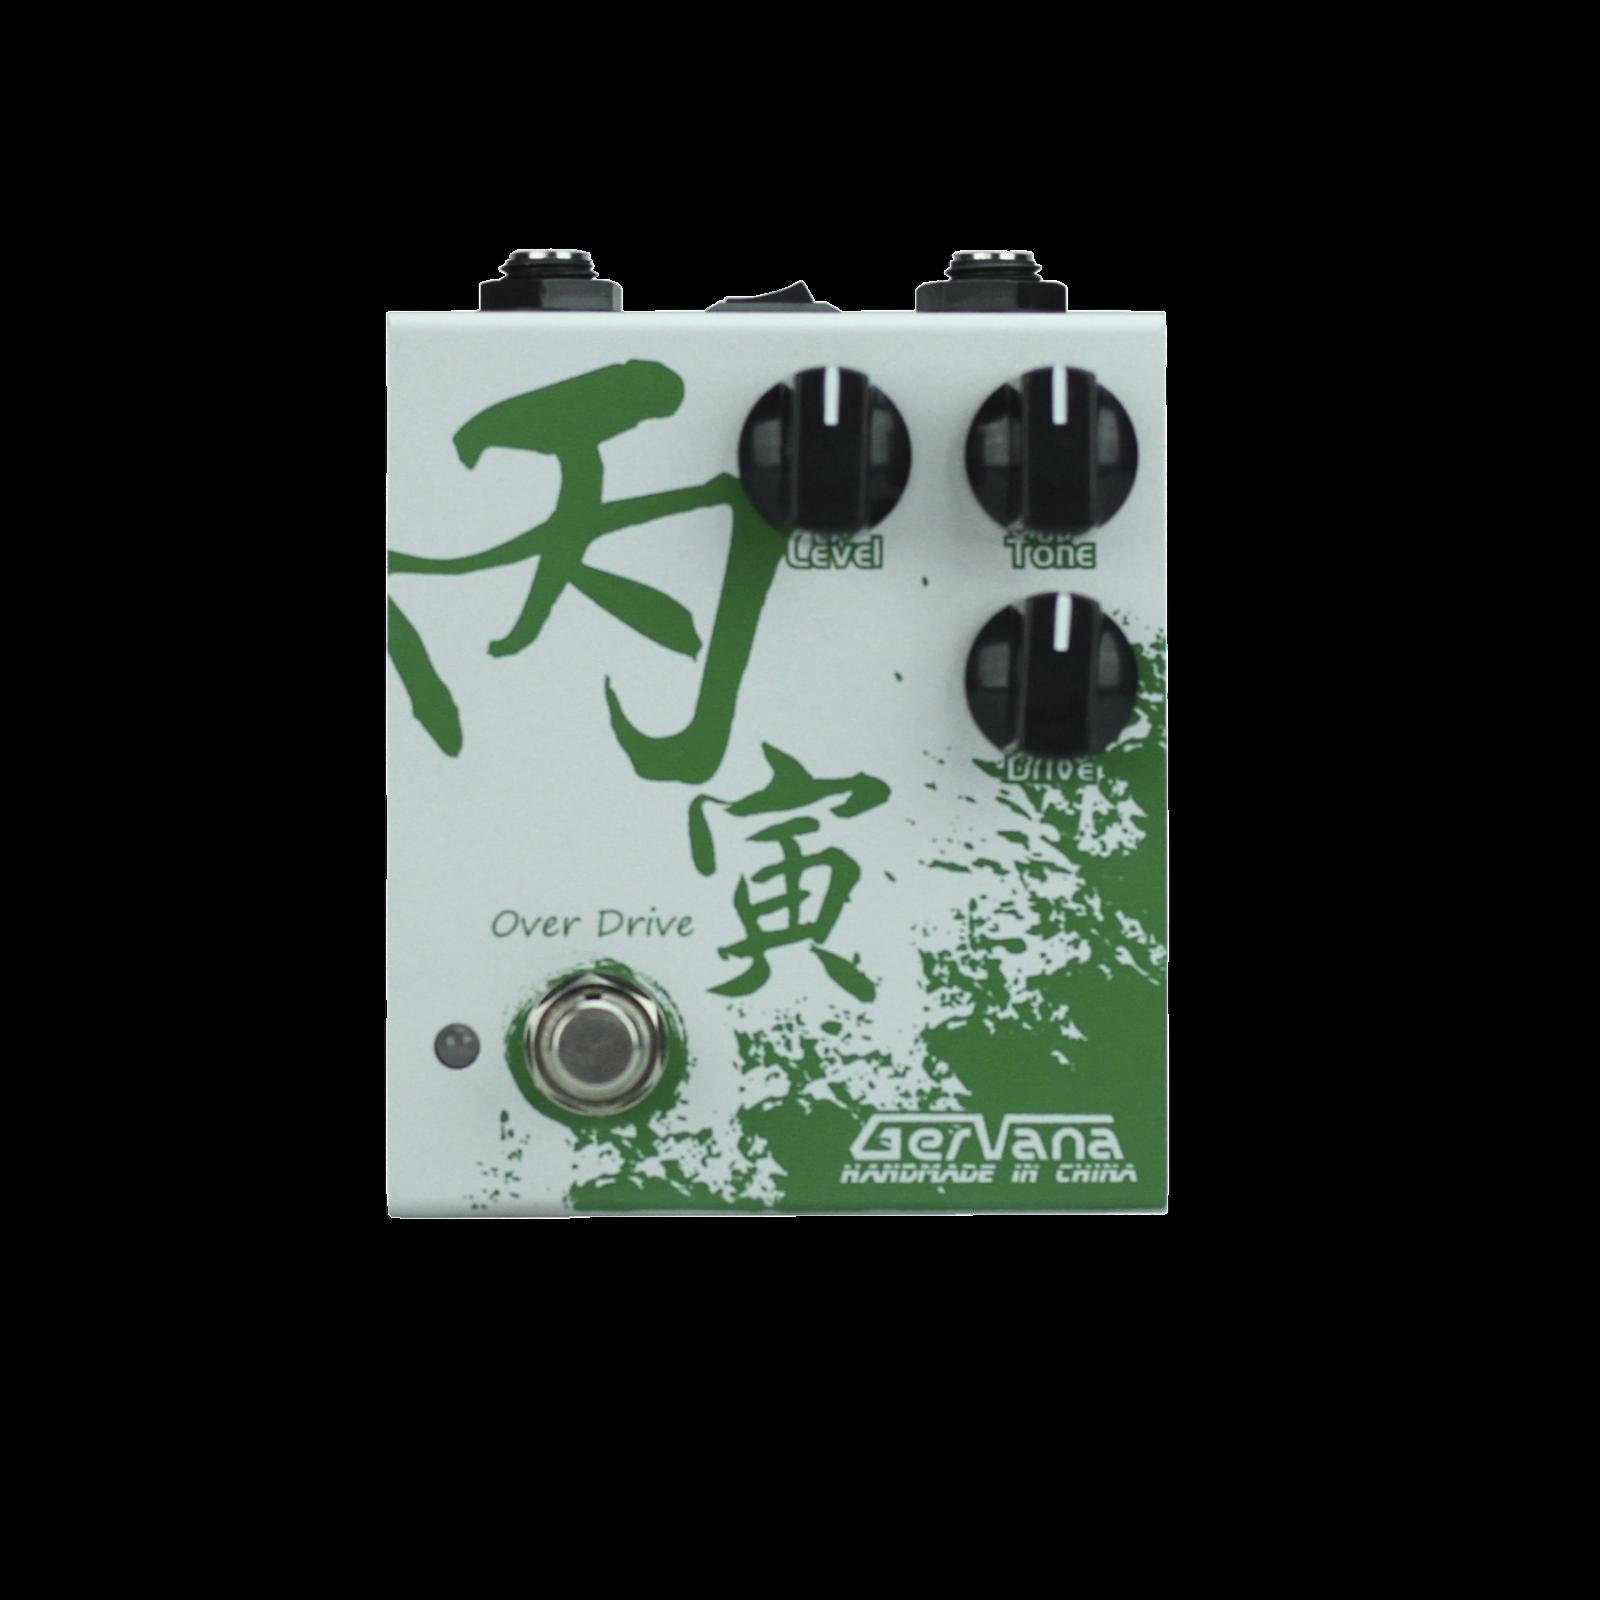 Gervana Bing Yin Hand-wirot Guitar Overdrive Pedal